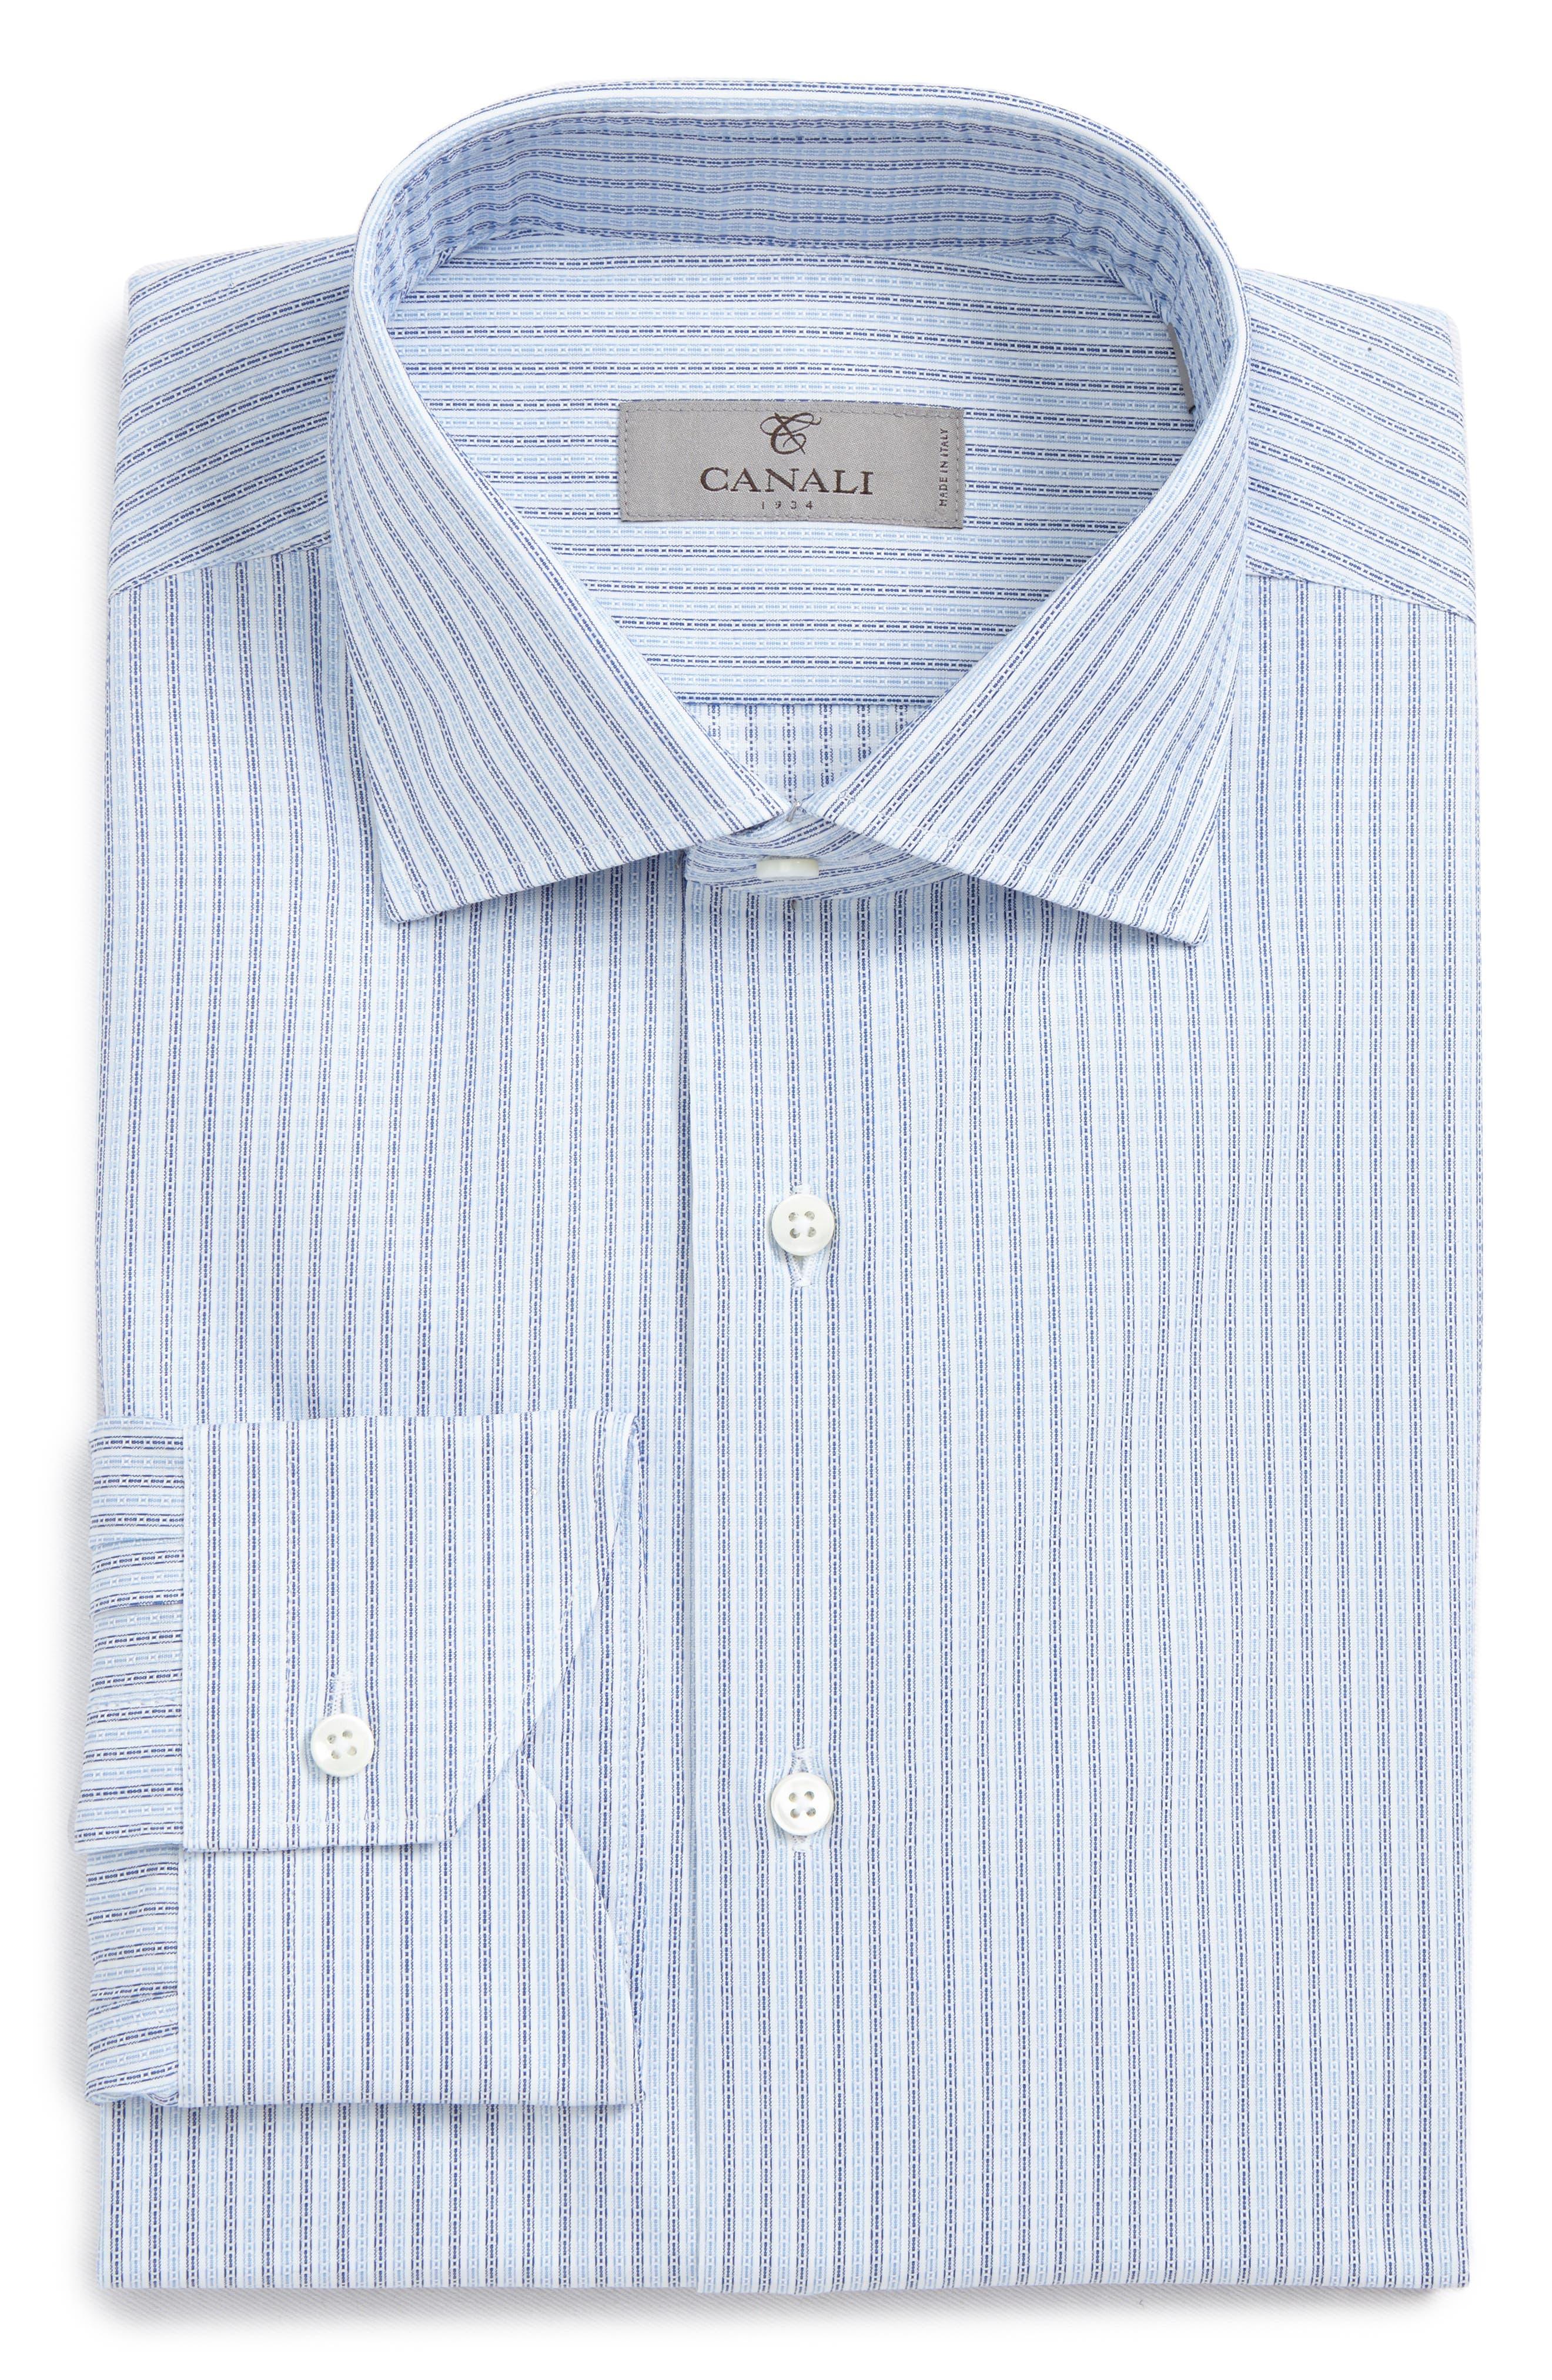 Regular Fit Geometric Dress Shirt,                         Main,                         color, Med Blue